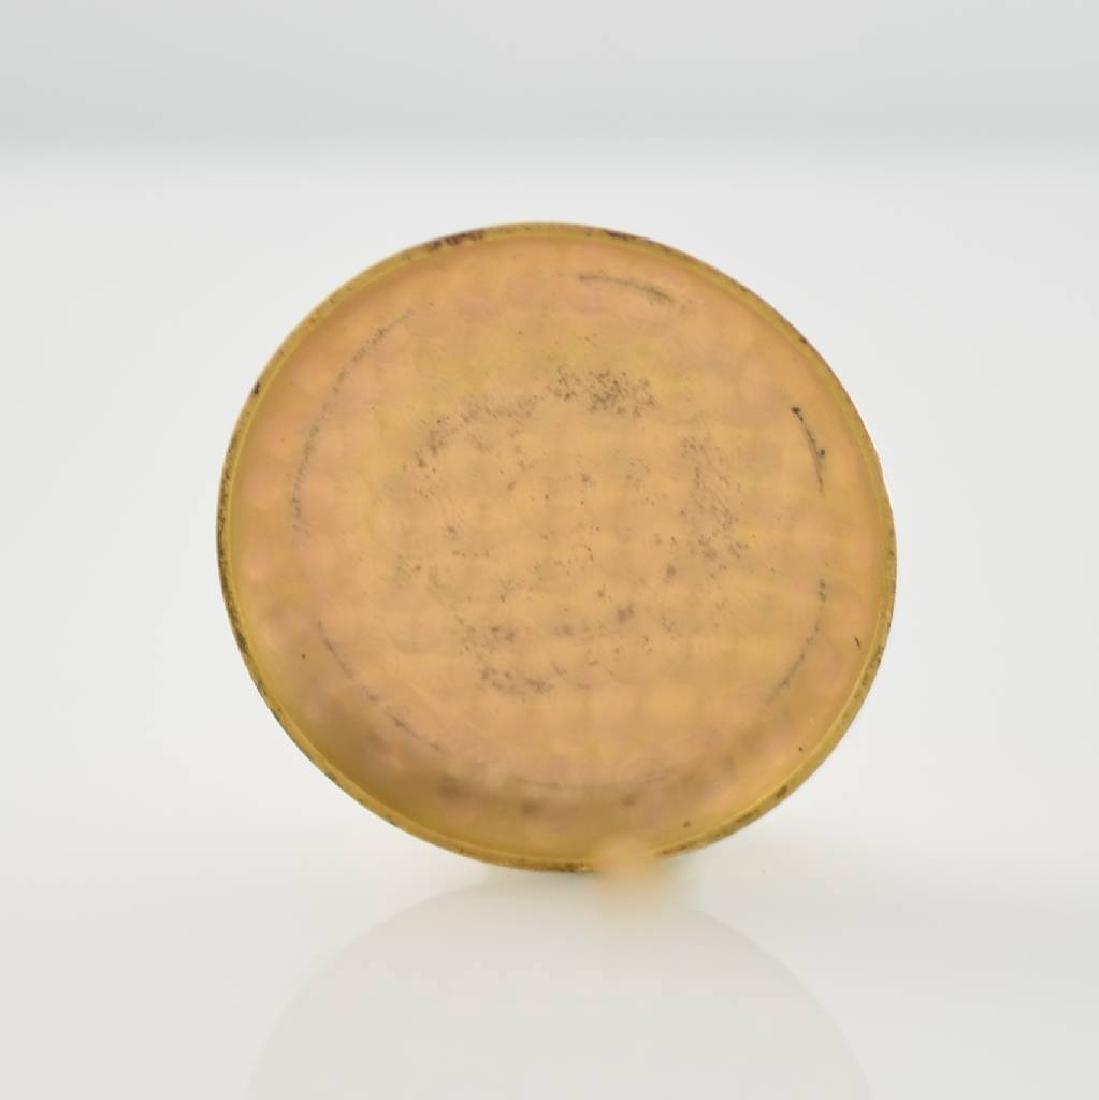 CHRONOGRAPHE SUISSE 18k gold intermediate wheel - 8